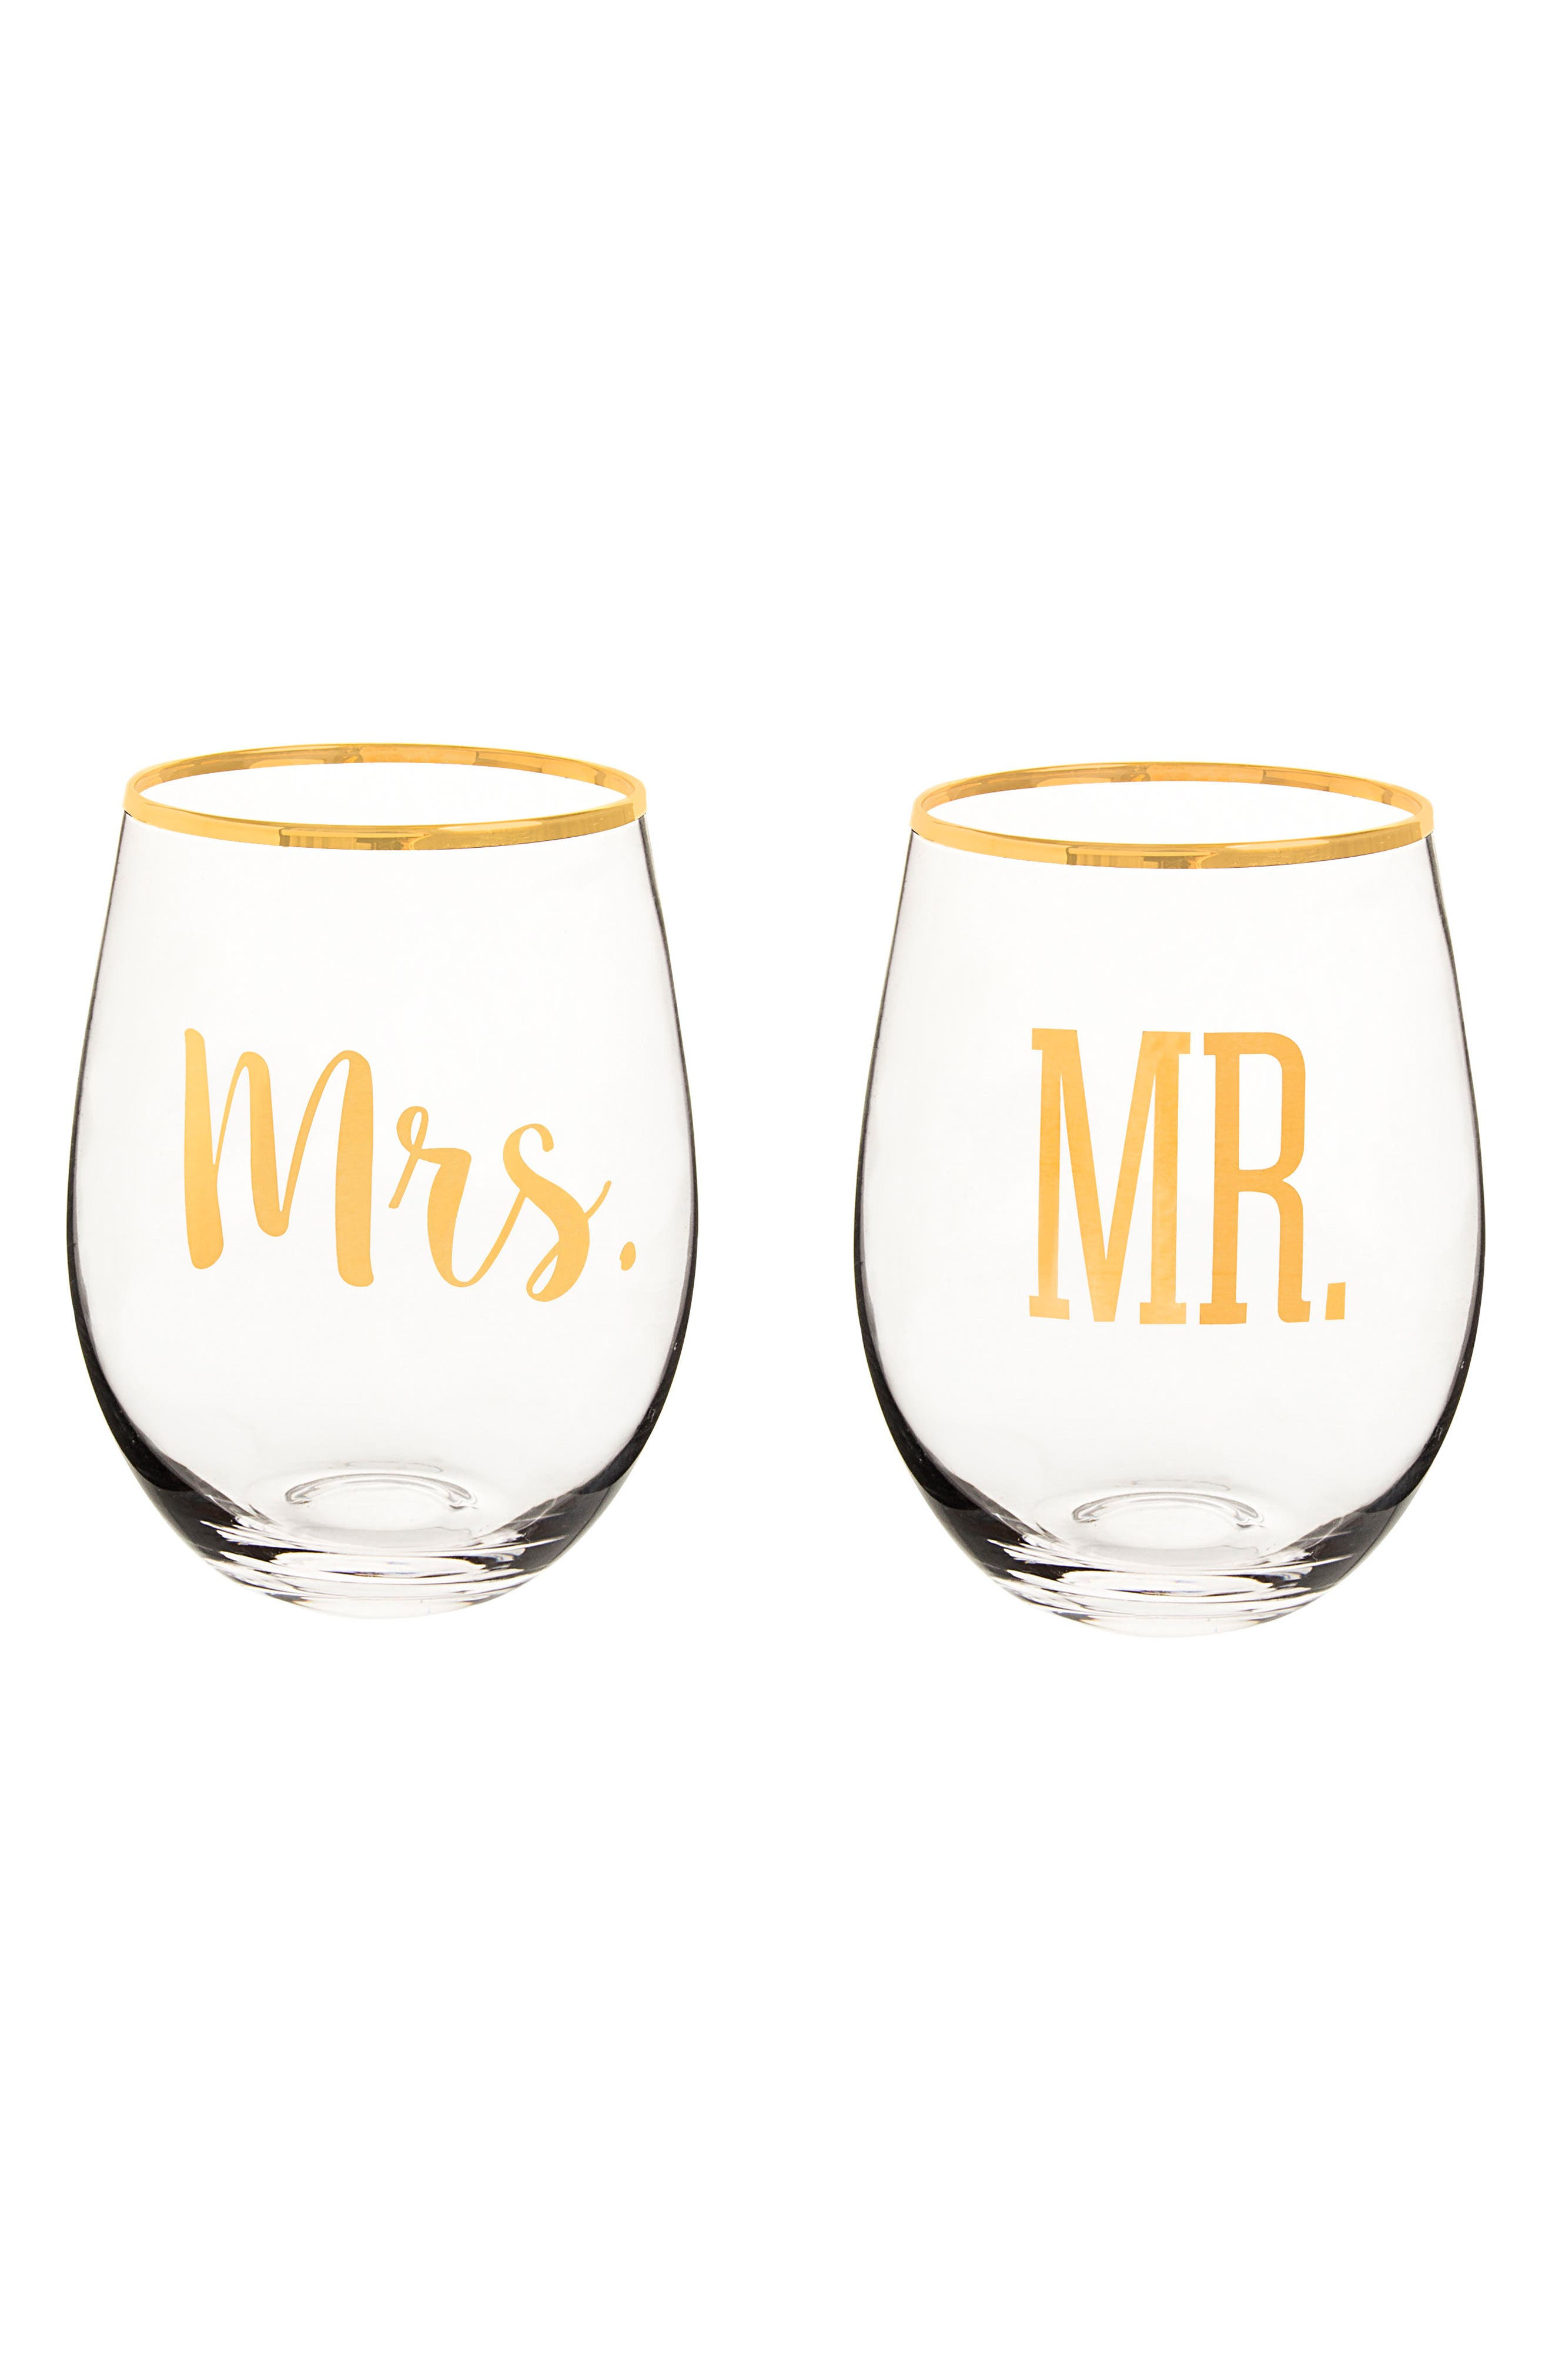 Mr. & Mrs. Set of 2 Stemless Wine Glasses,                         Main,                         color, 710